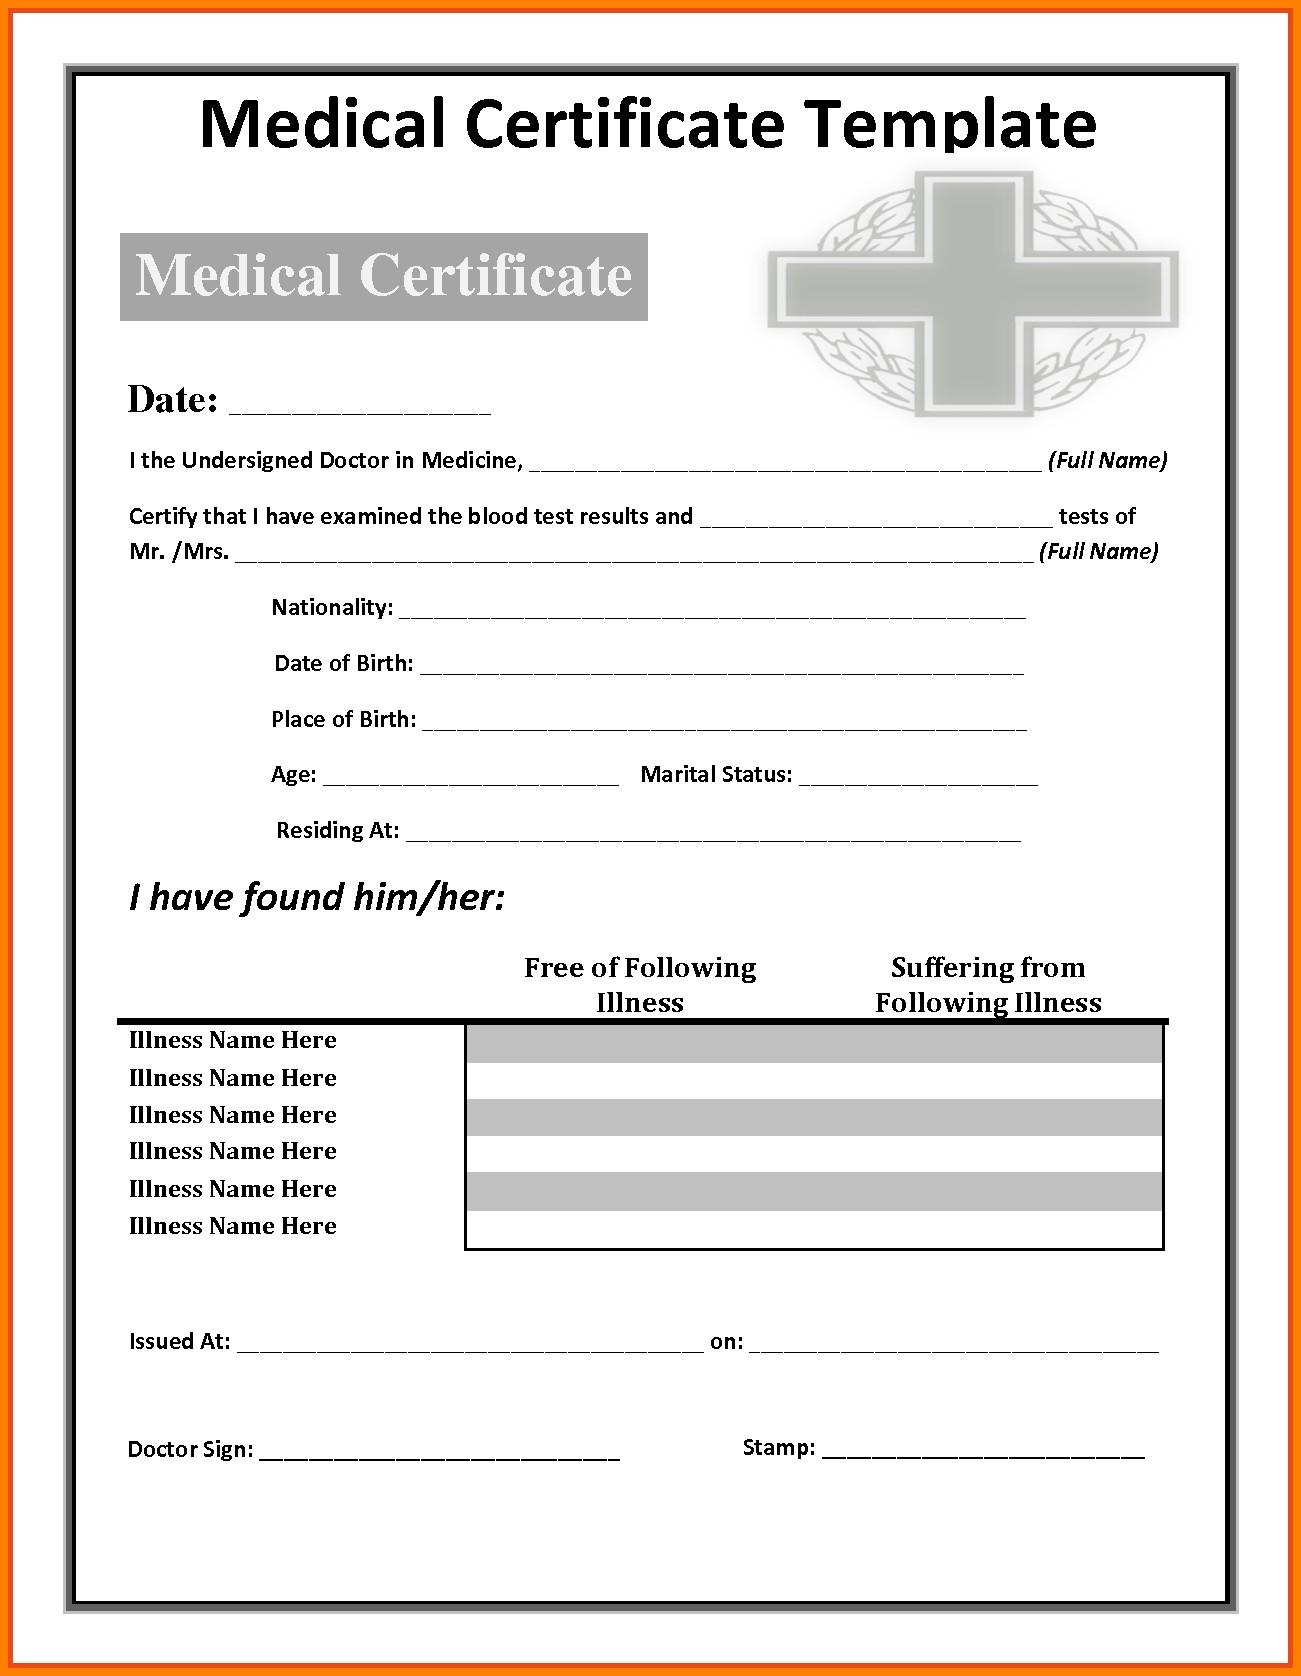 Fake Medical Certificate Template Download In Fake Medical Certificate Template Download